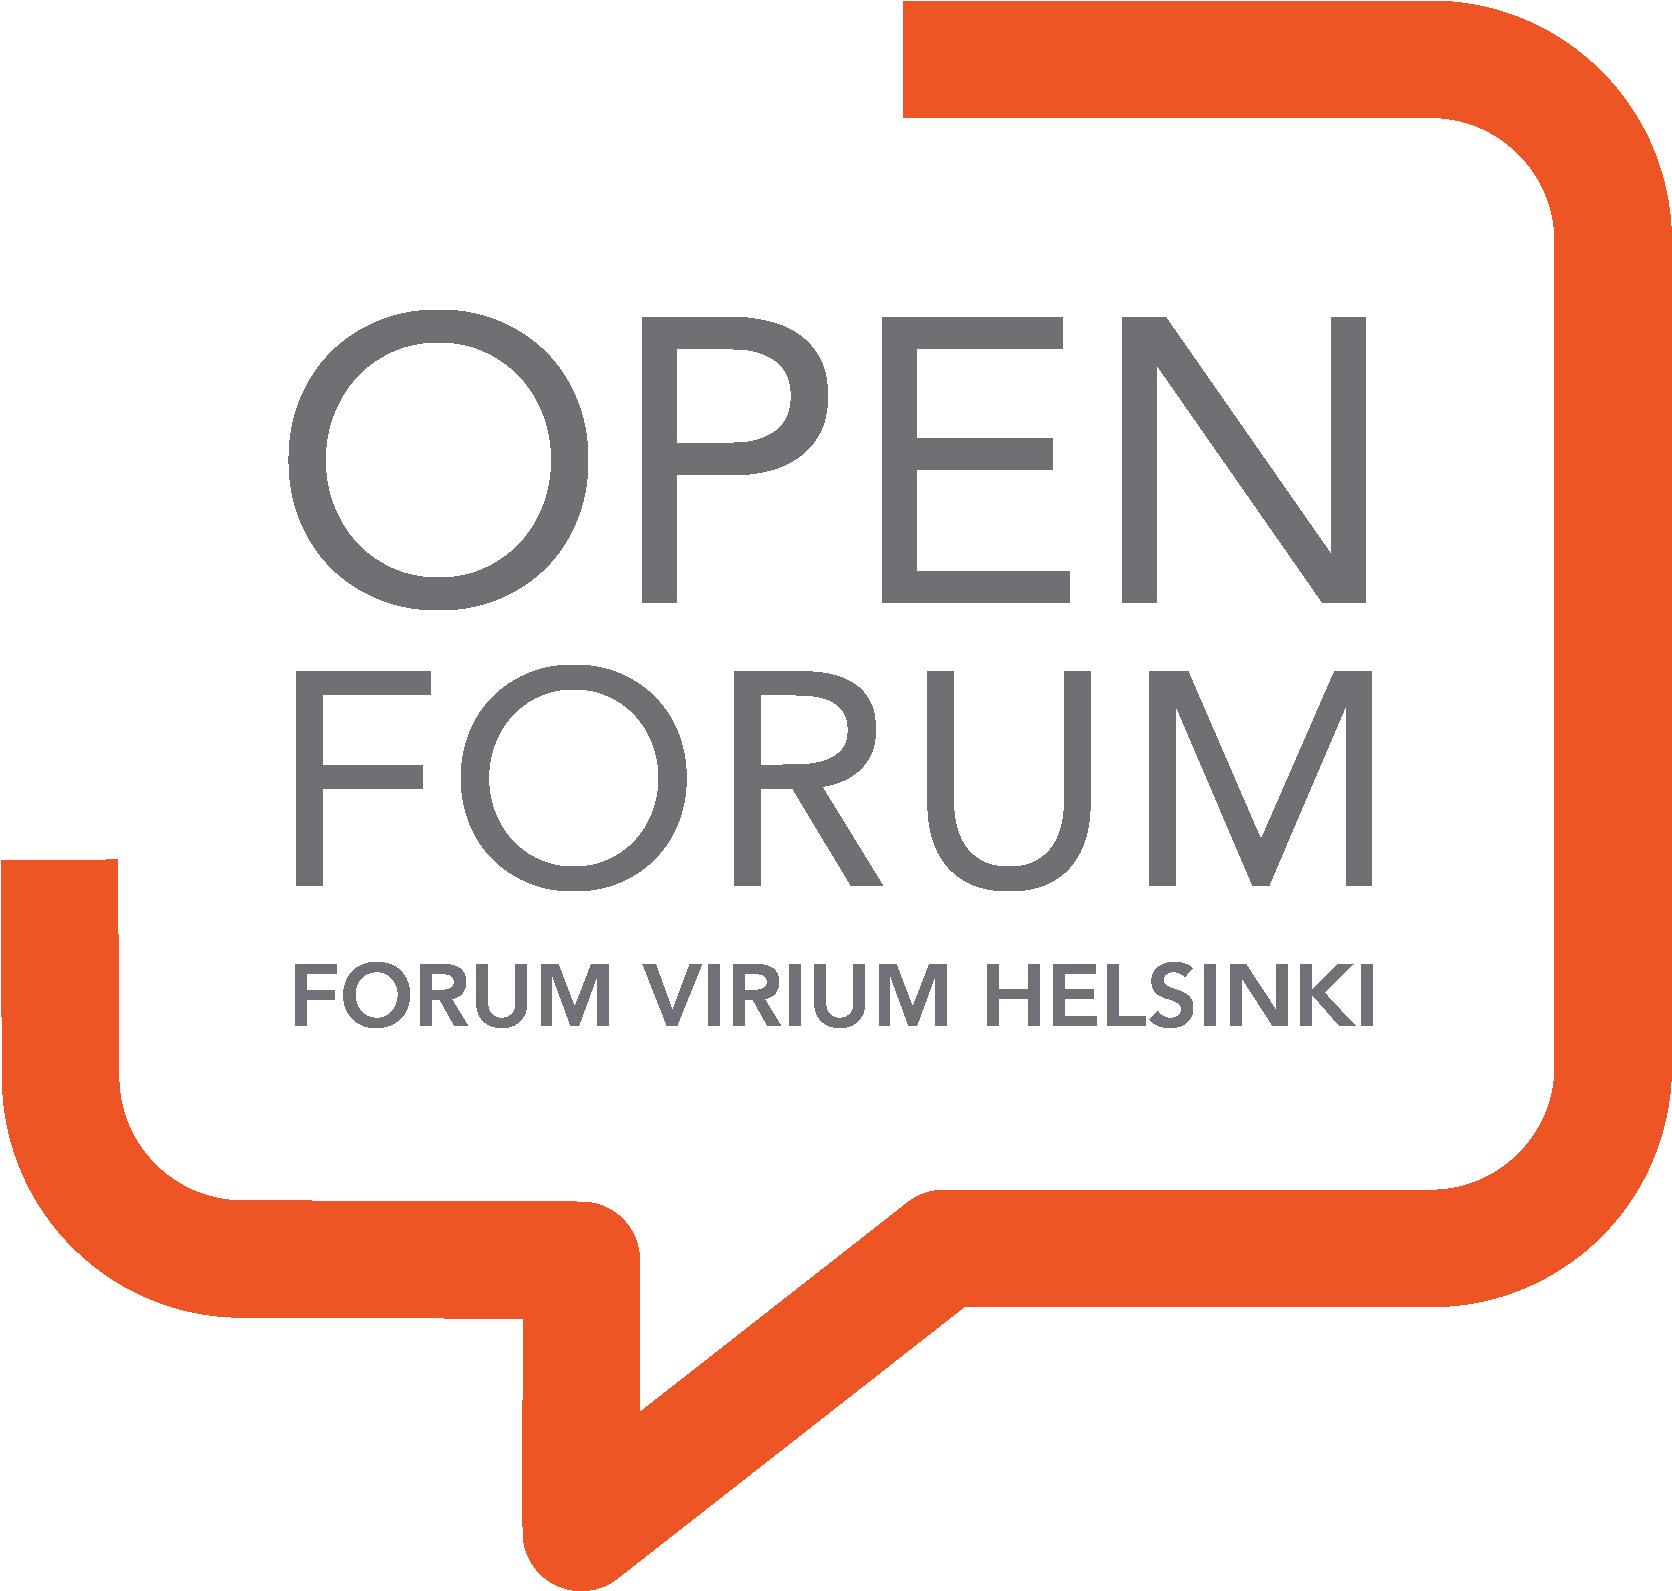 Open Forum - Forum Virium Helsinki